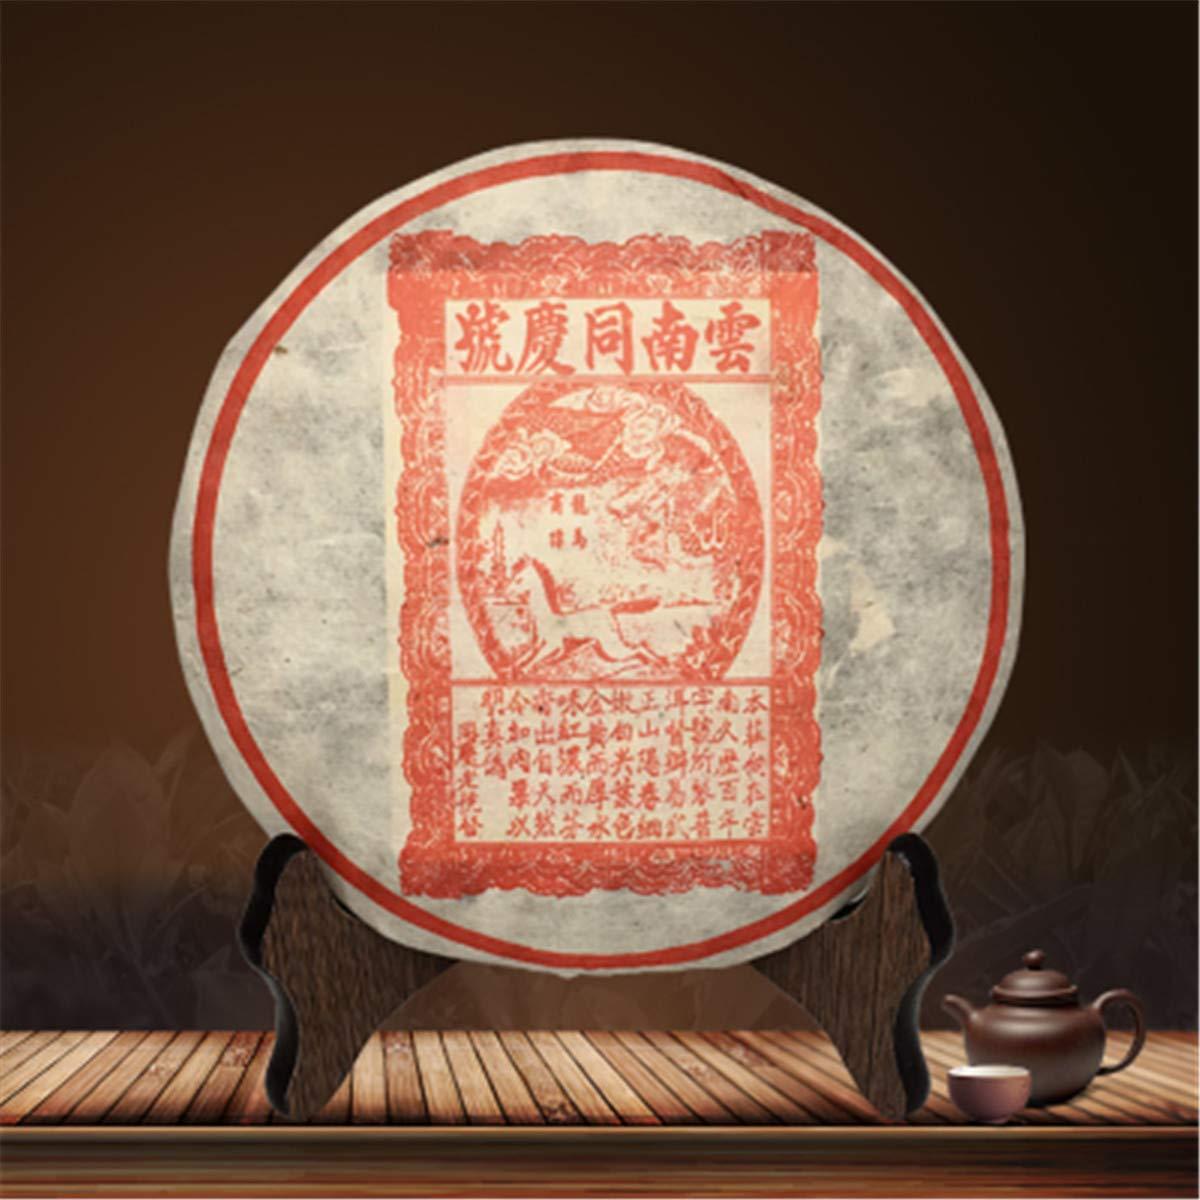 Chinese Pu'er Tea 357g(0.787LB)Ripe Puer Tea Black Tea Yunnan Tong Qing Hao Pu'er Tea Old Pu-erh Tea Cooked Tea Old Trees Pu erh Tea Health Care Pu er Tea Healthy Puerh Tea Green Food